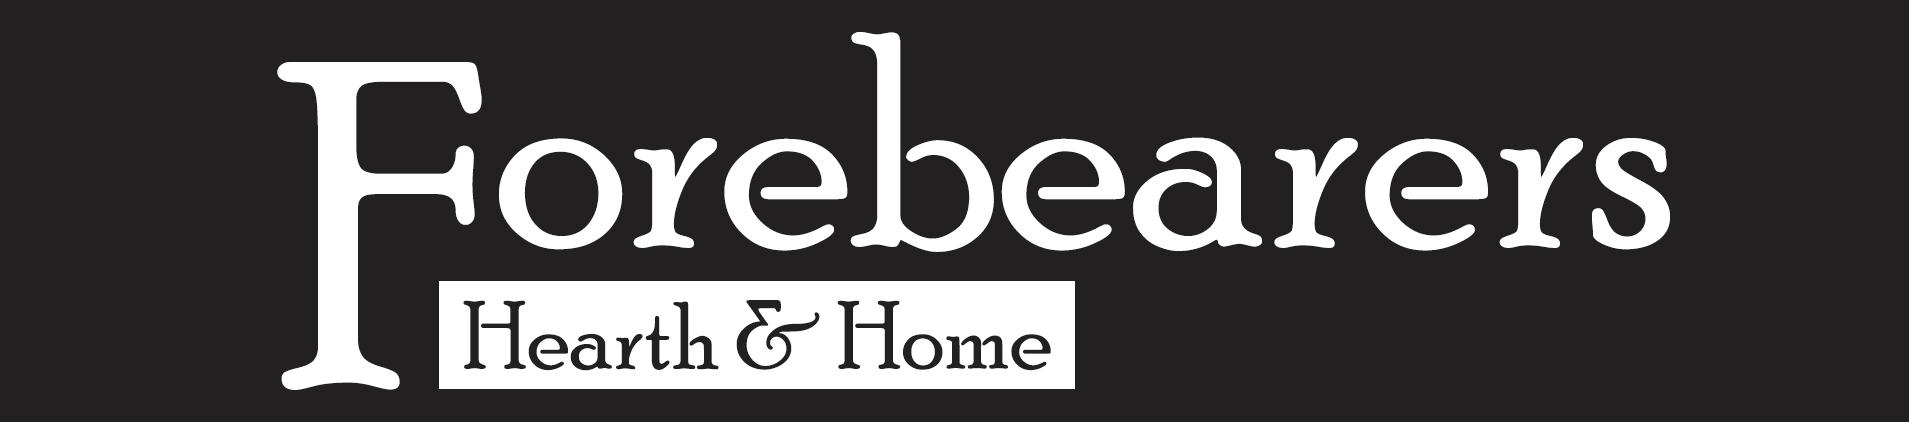 Forebearers - Hearth & Home